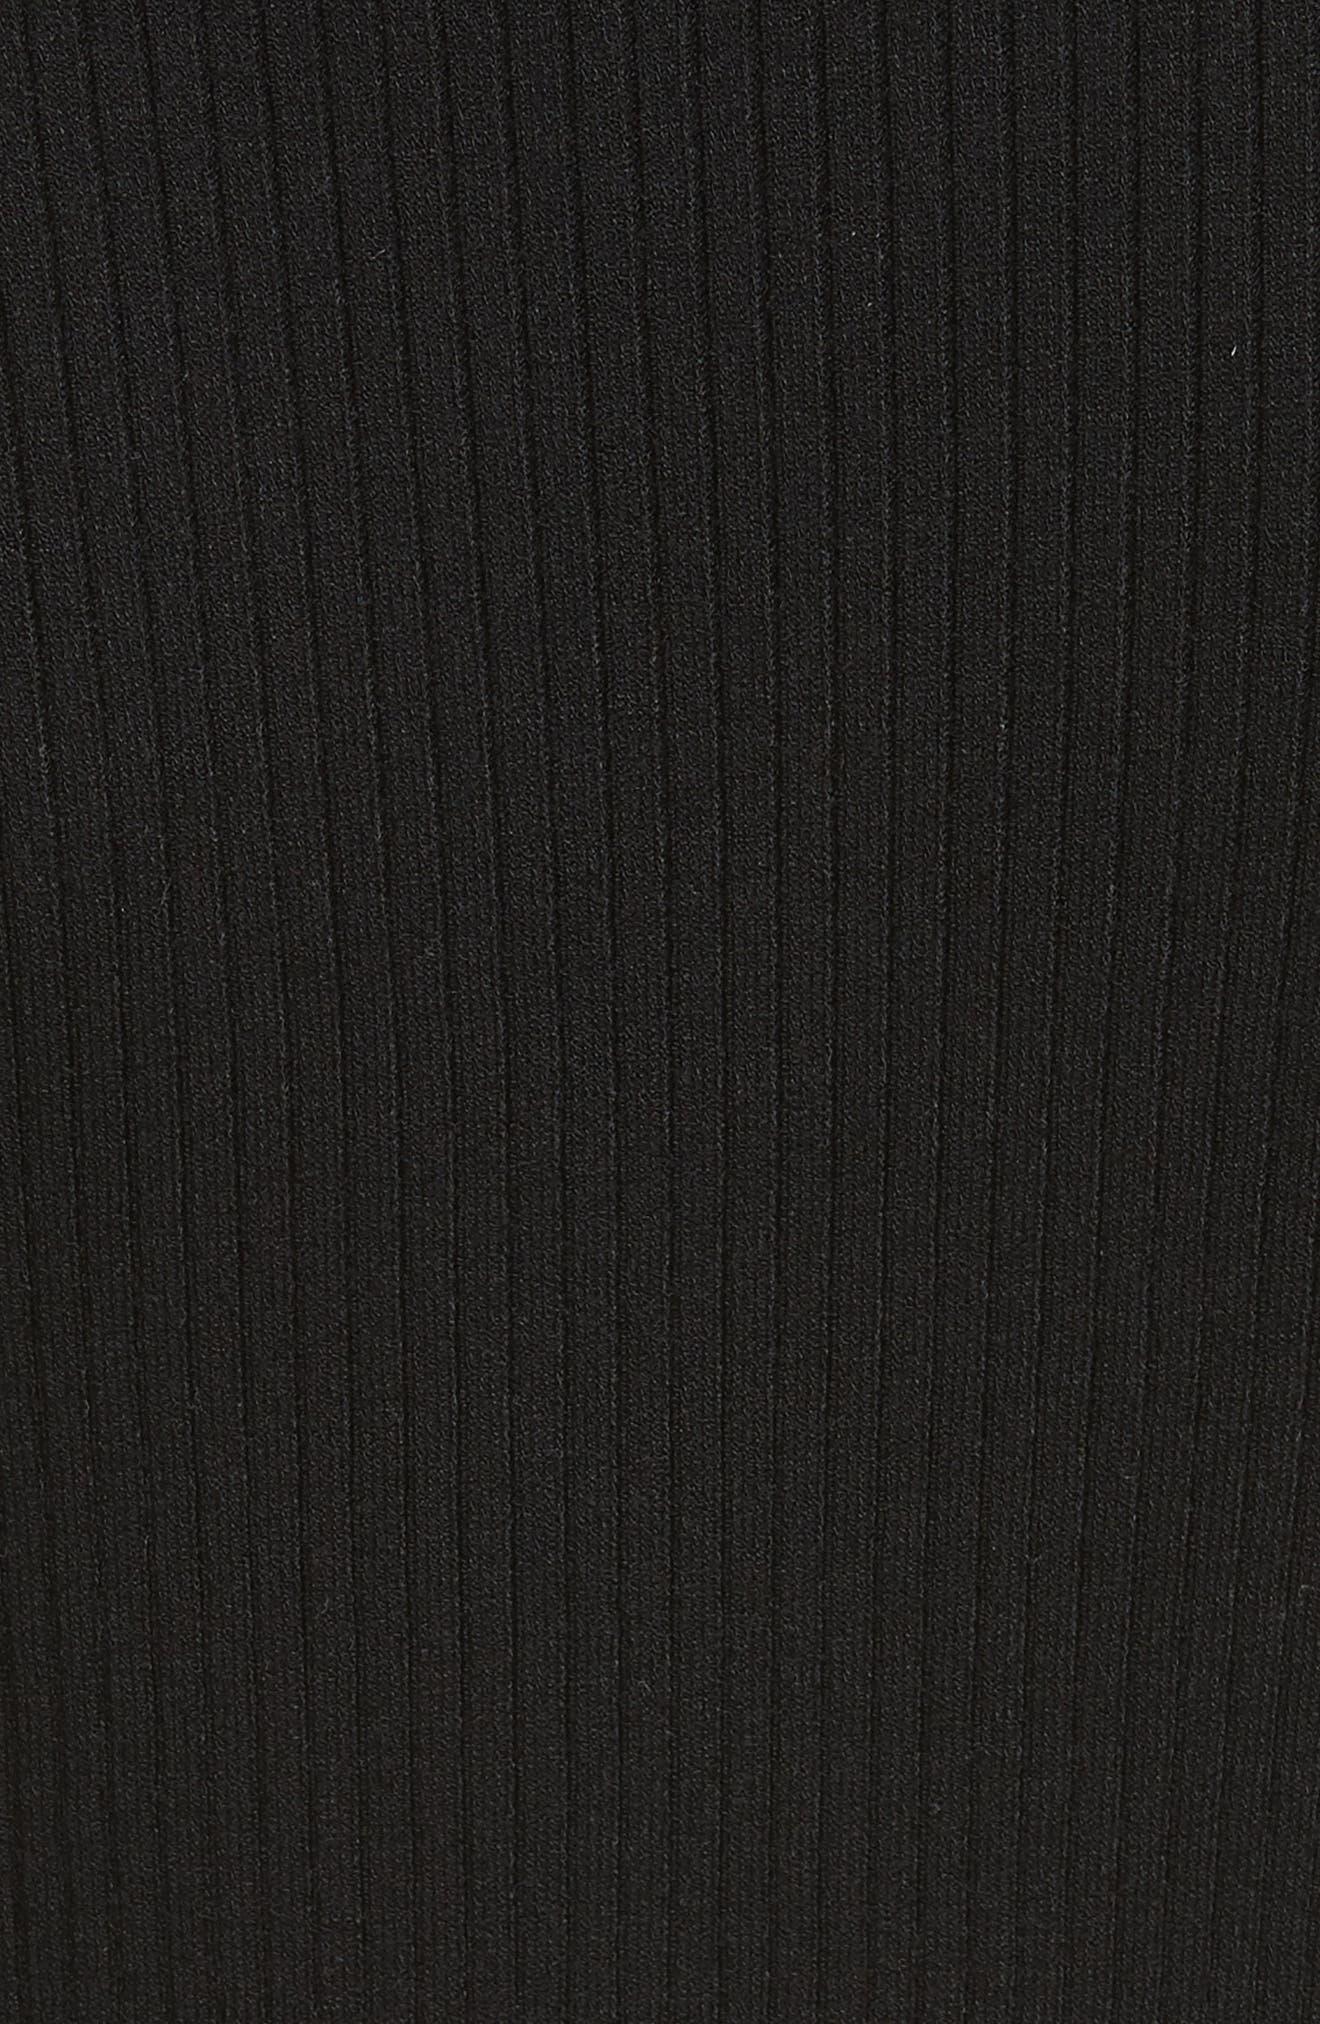 Metallic Knit Sweater,                             Alternate thumbnail 5, color,